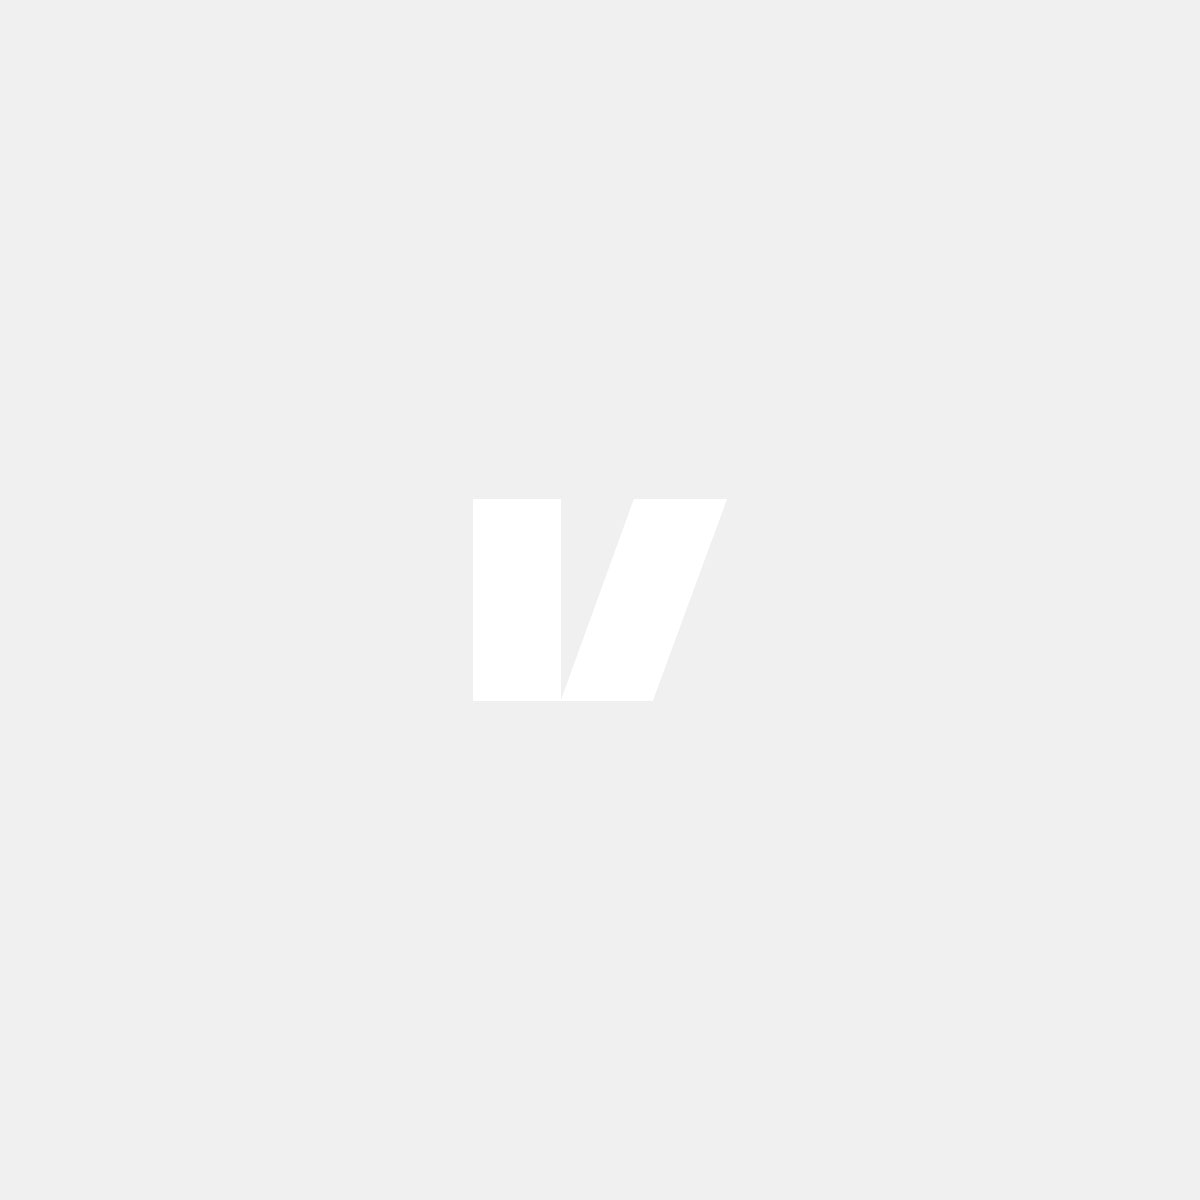 Kolfibervinge till Volvo V70, XC70 08-